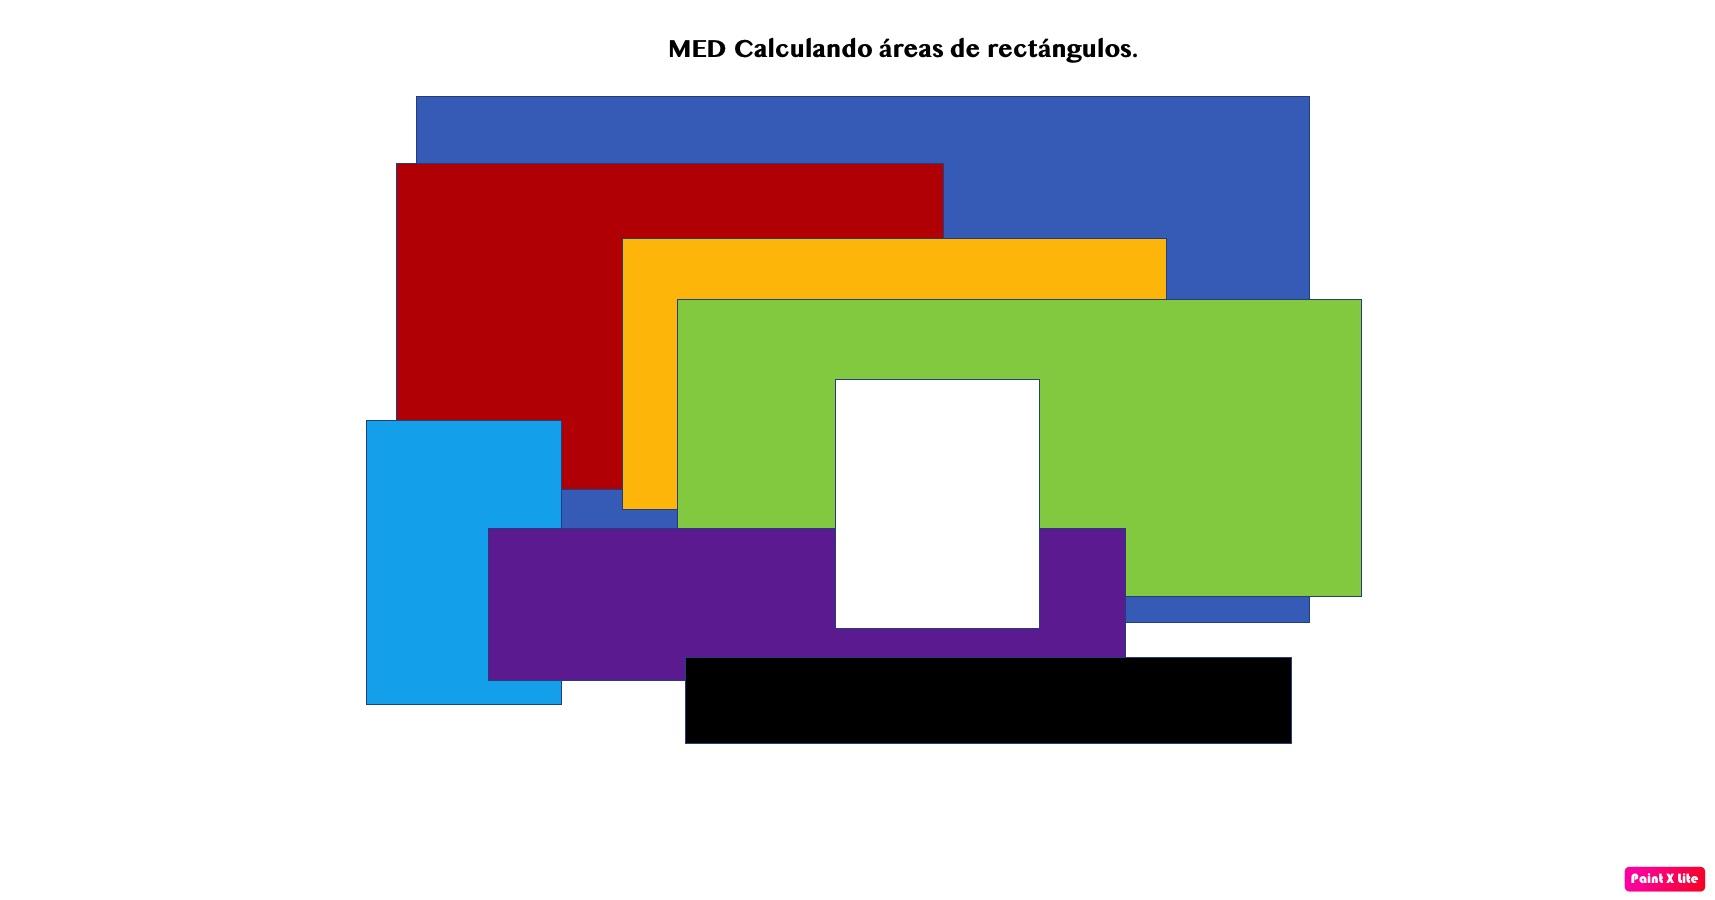 Calculando+a%CC%81reas+de+recta%CC%81ngulos.jpg